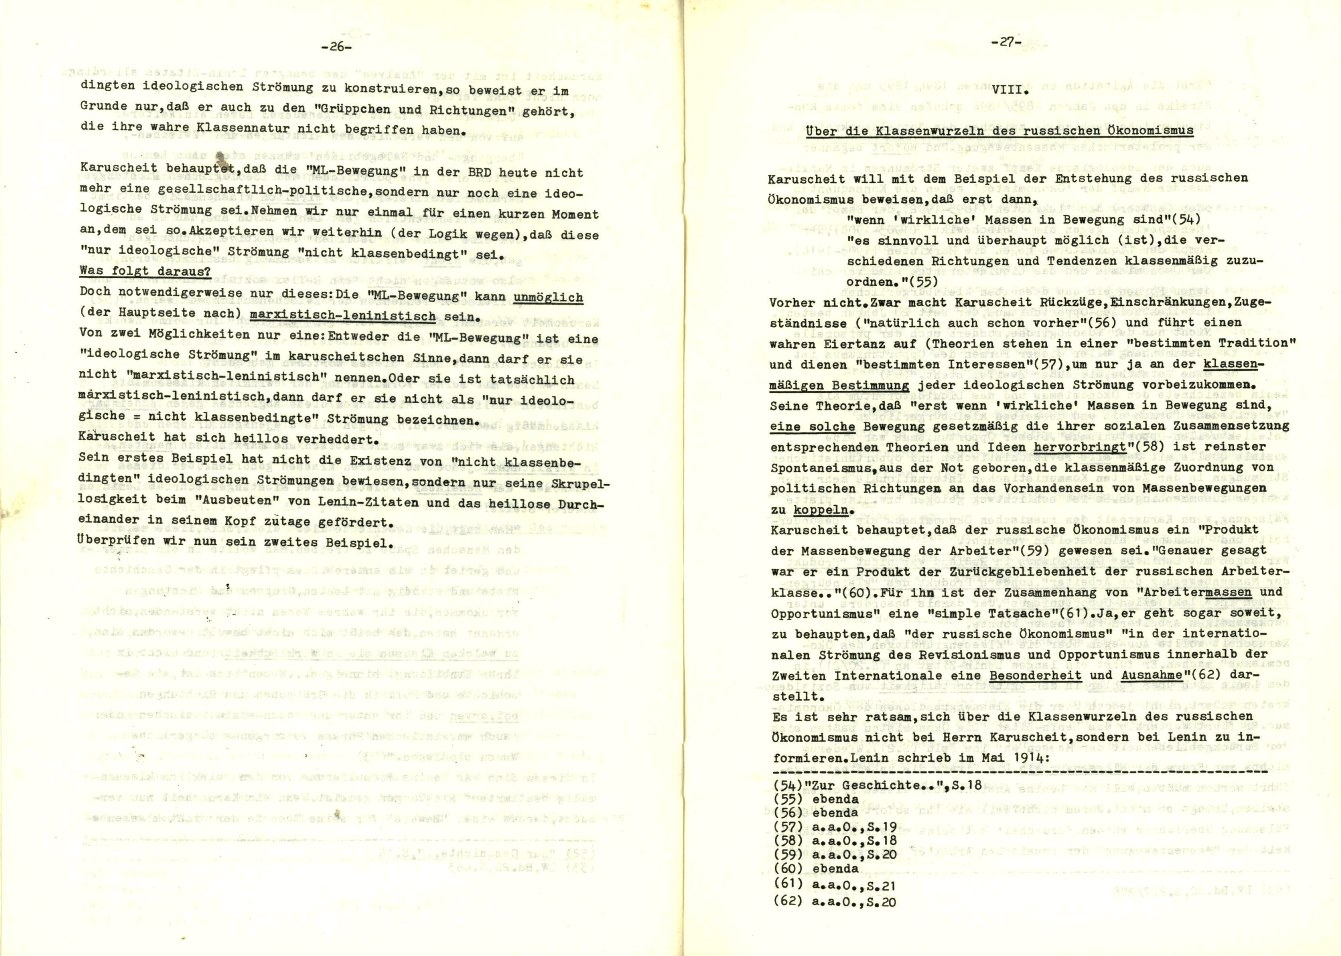 Muenchen_Kampf_dem_Revisionismus_1979_09_14